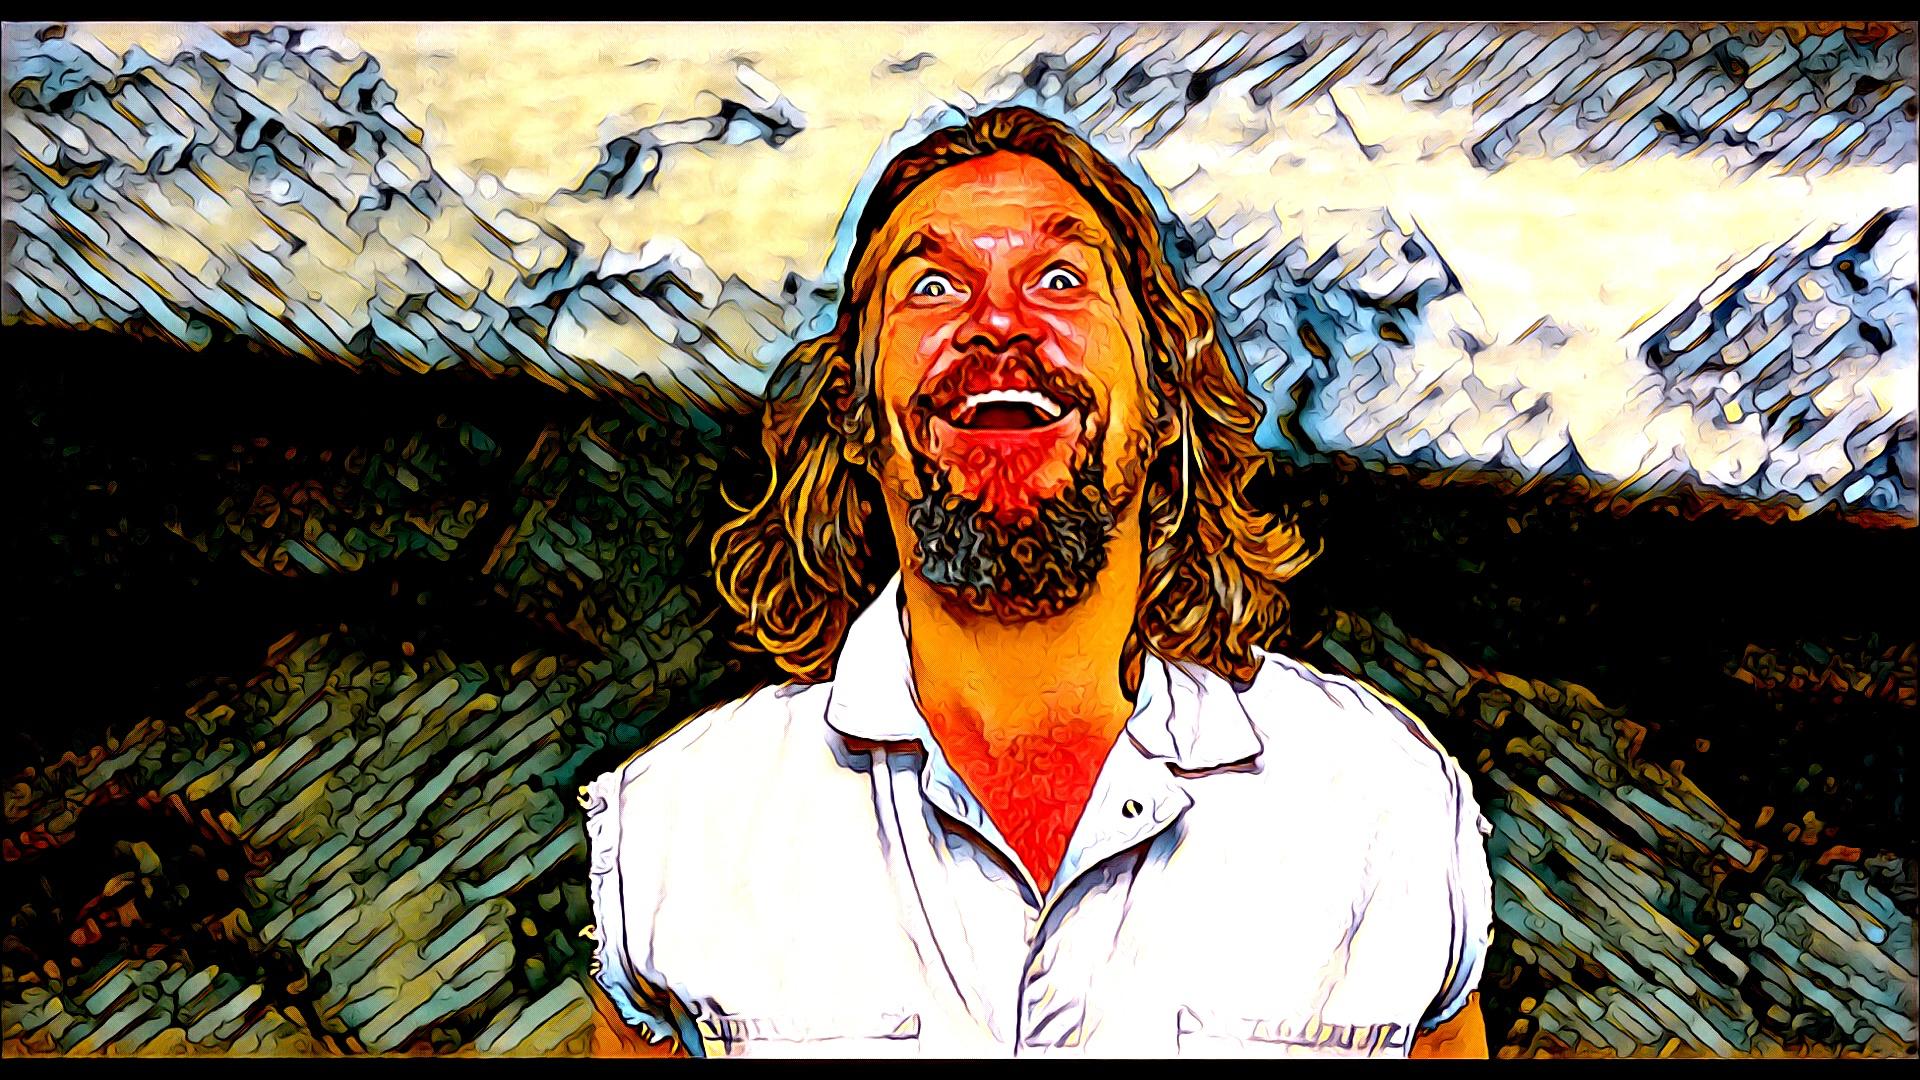 The Big Lebowski Wallpapers – The Dude Grins | LeeCo Web